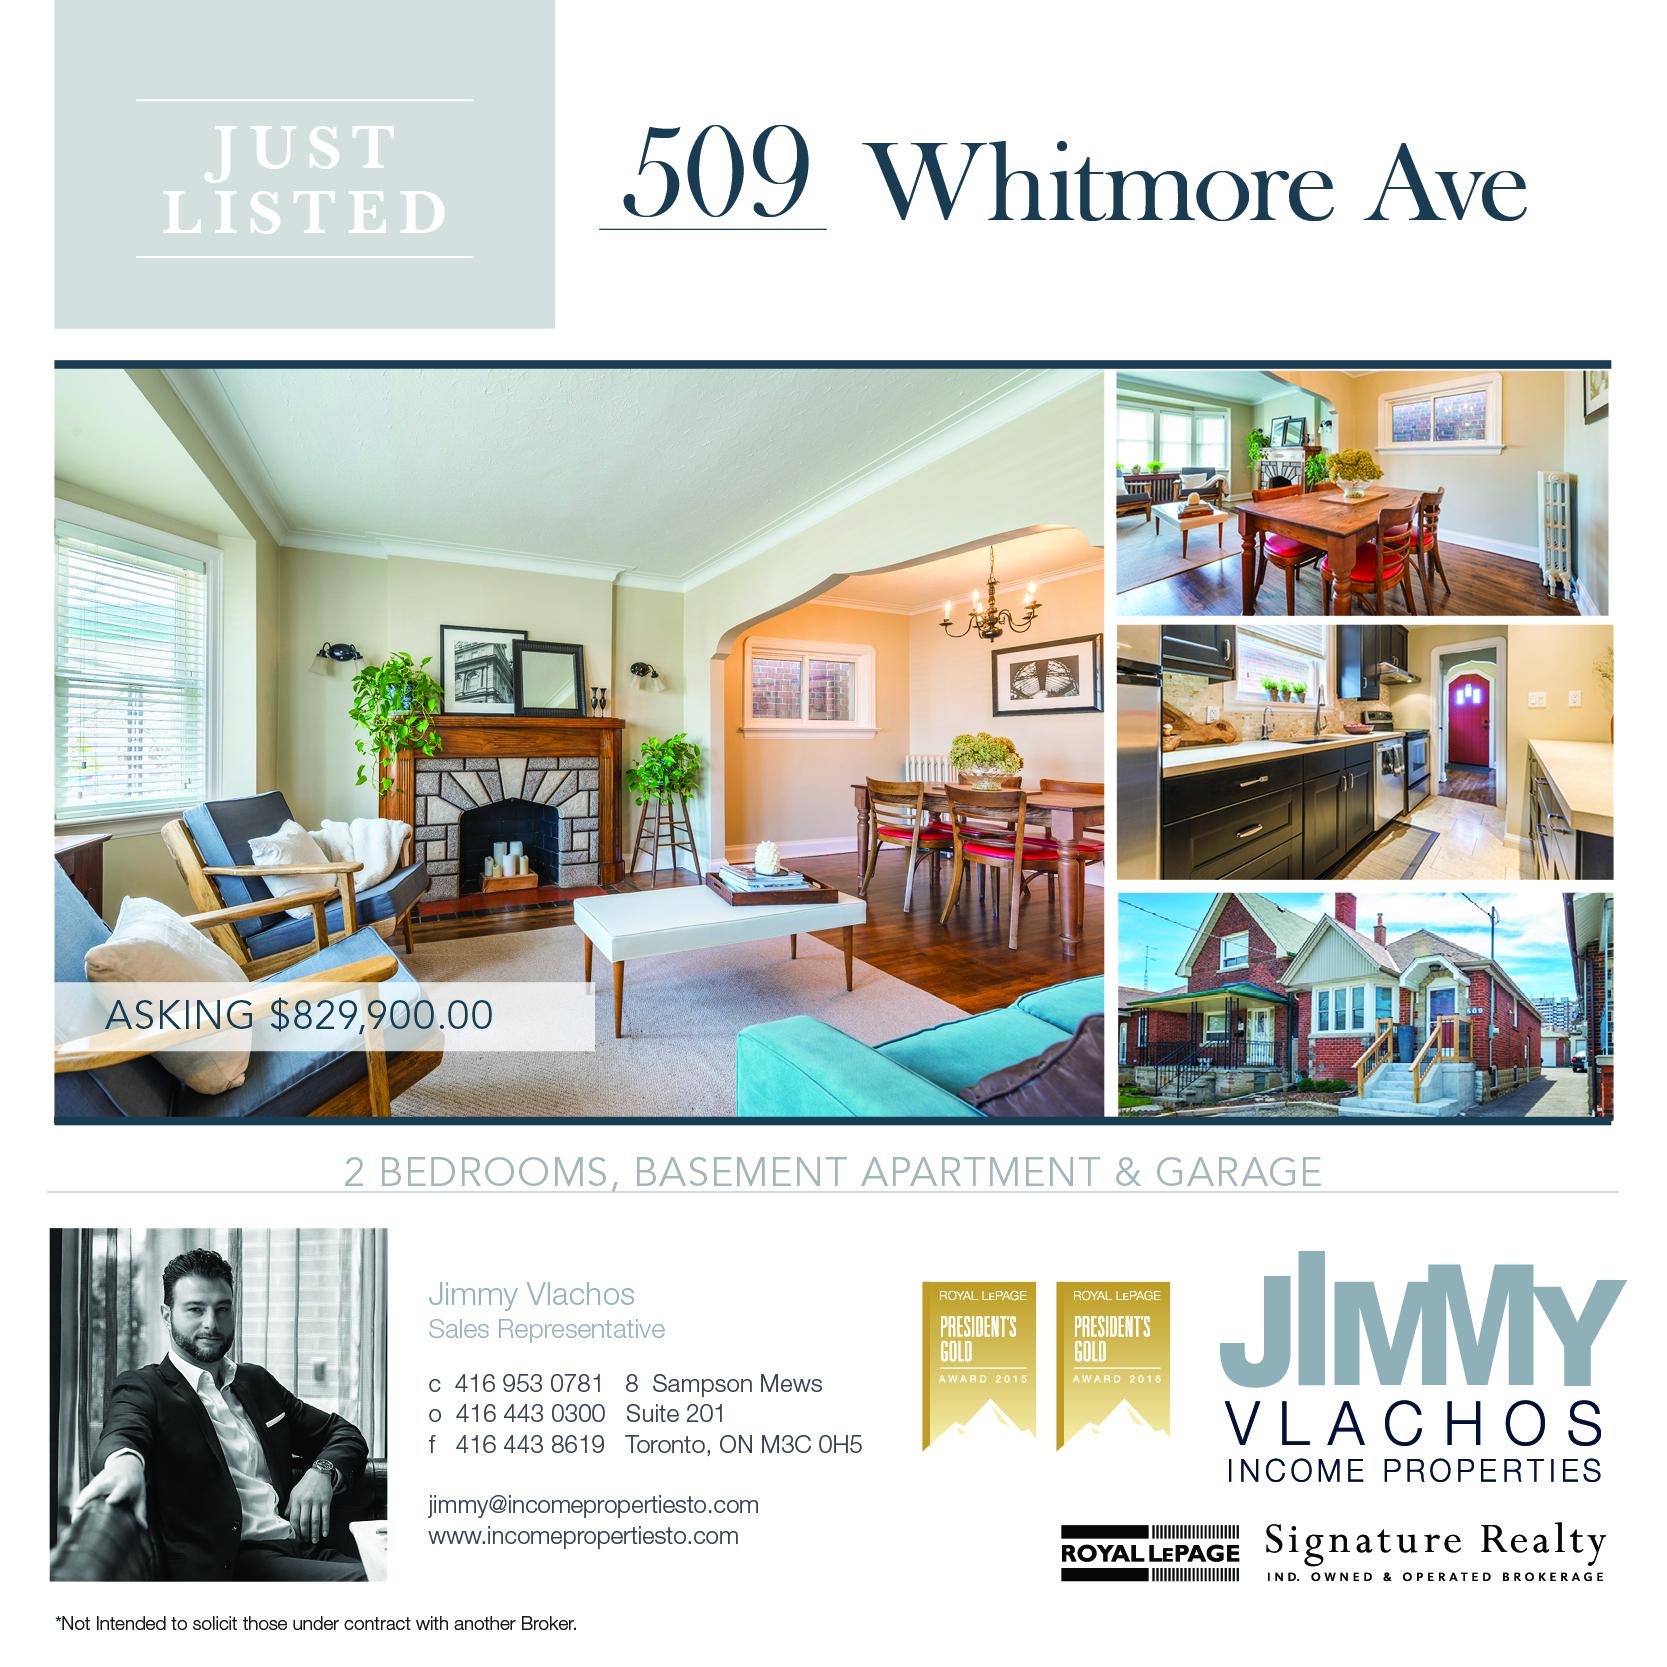 JimmyVlachos_WhitemoreAve_509_Posh_JL_SOCIALMEDIA_800x800_March30_2017